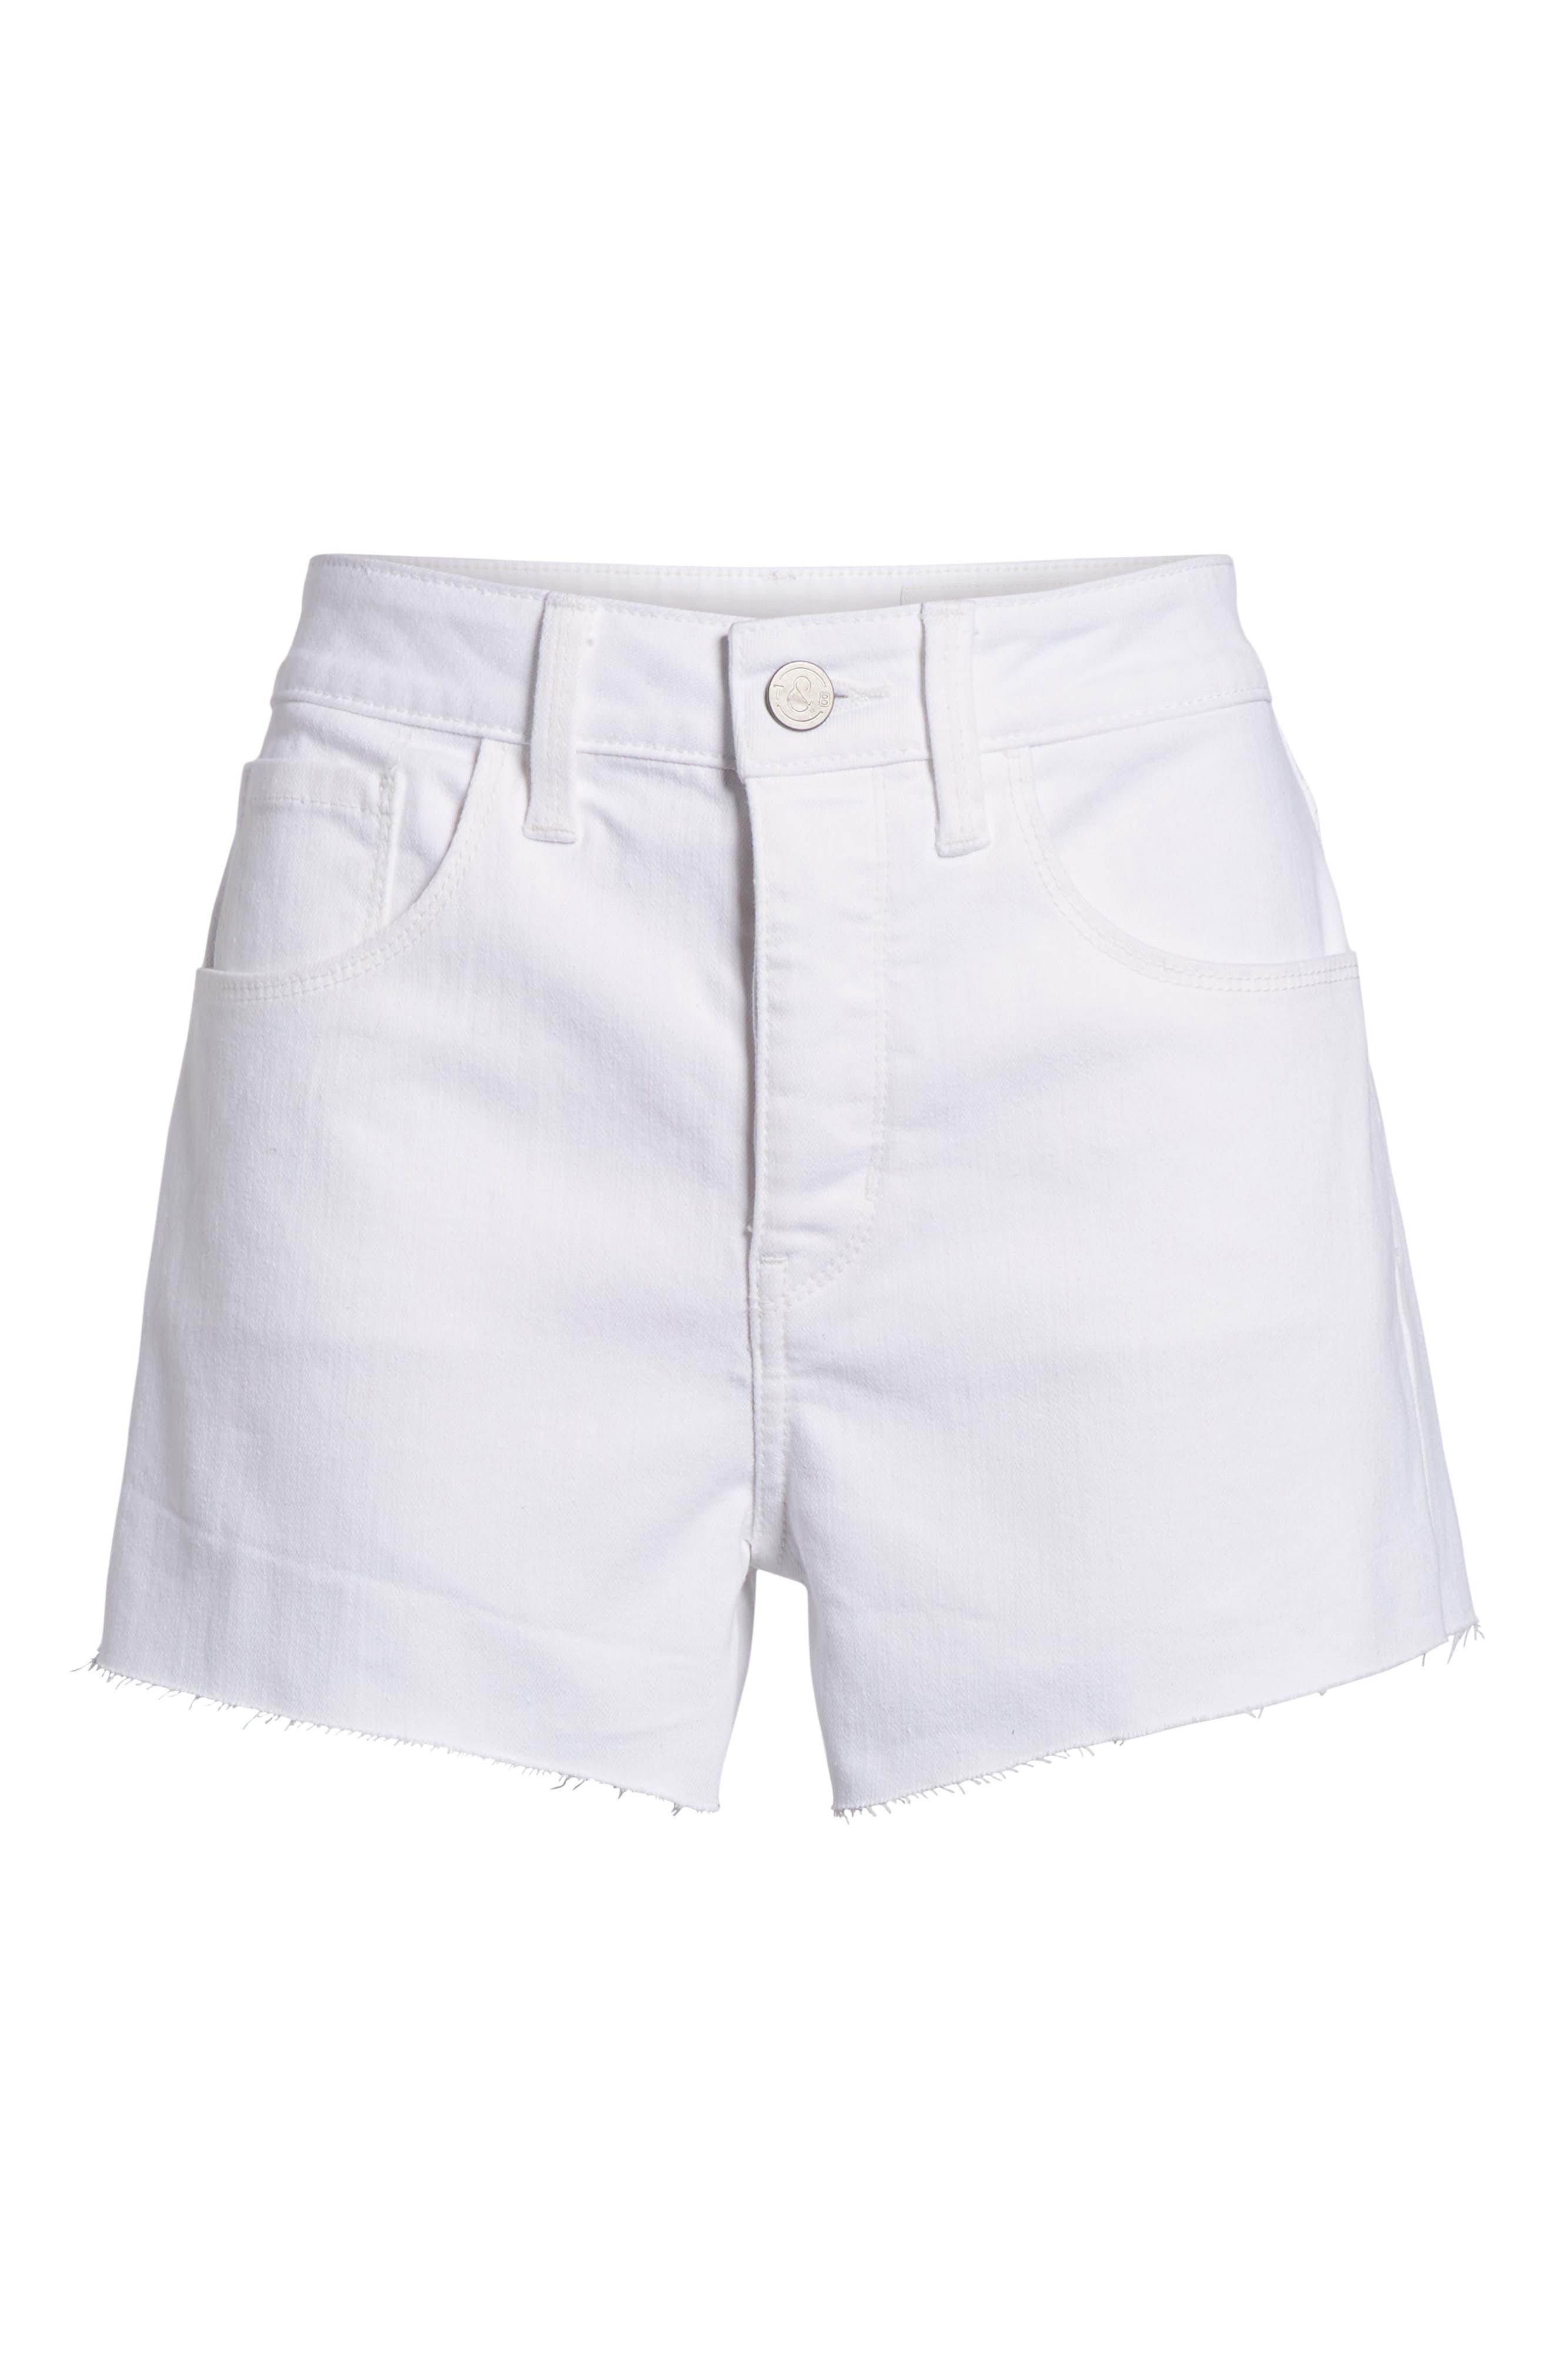 High Waist Cutoff Denim Shorts,                             Alternate thumbnail 6, color,                             100